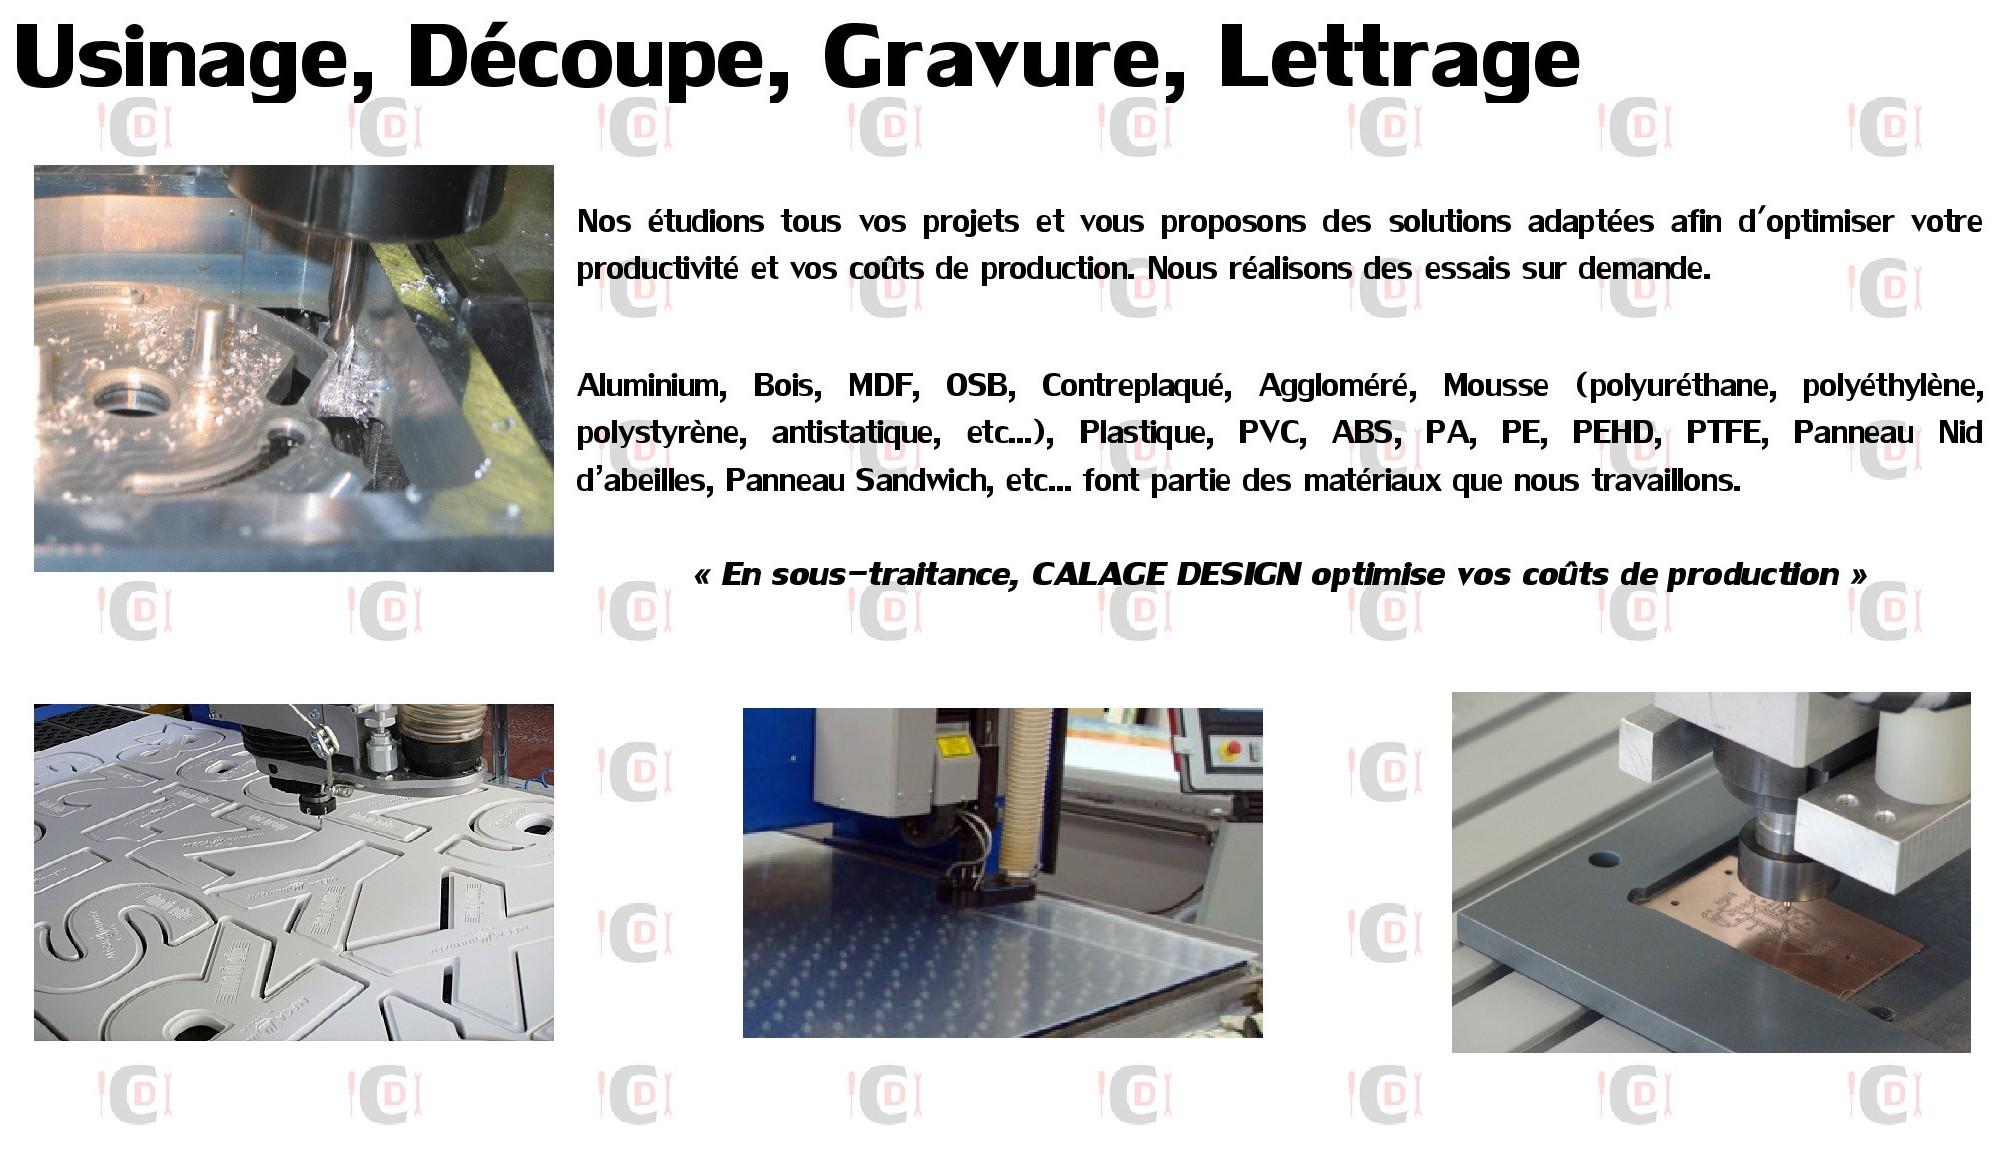 usinage d coupe gravure lettrage calage design. Black Bedroom Furniture Sets. Home Design Ideas